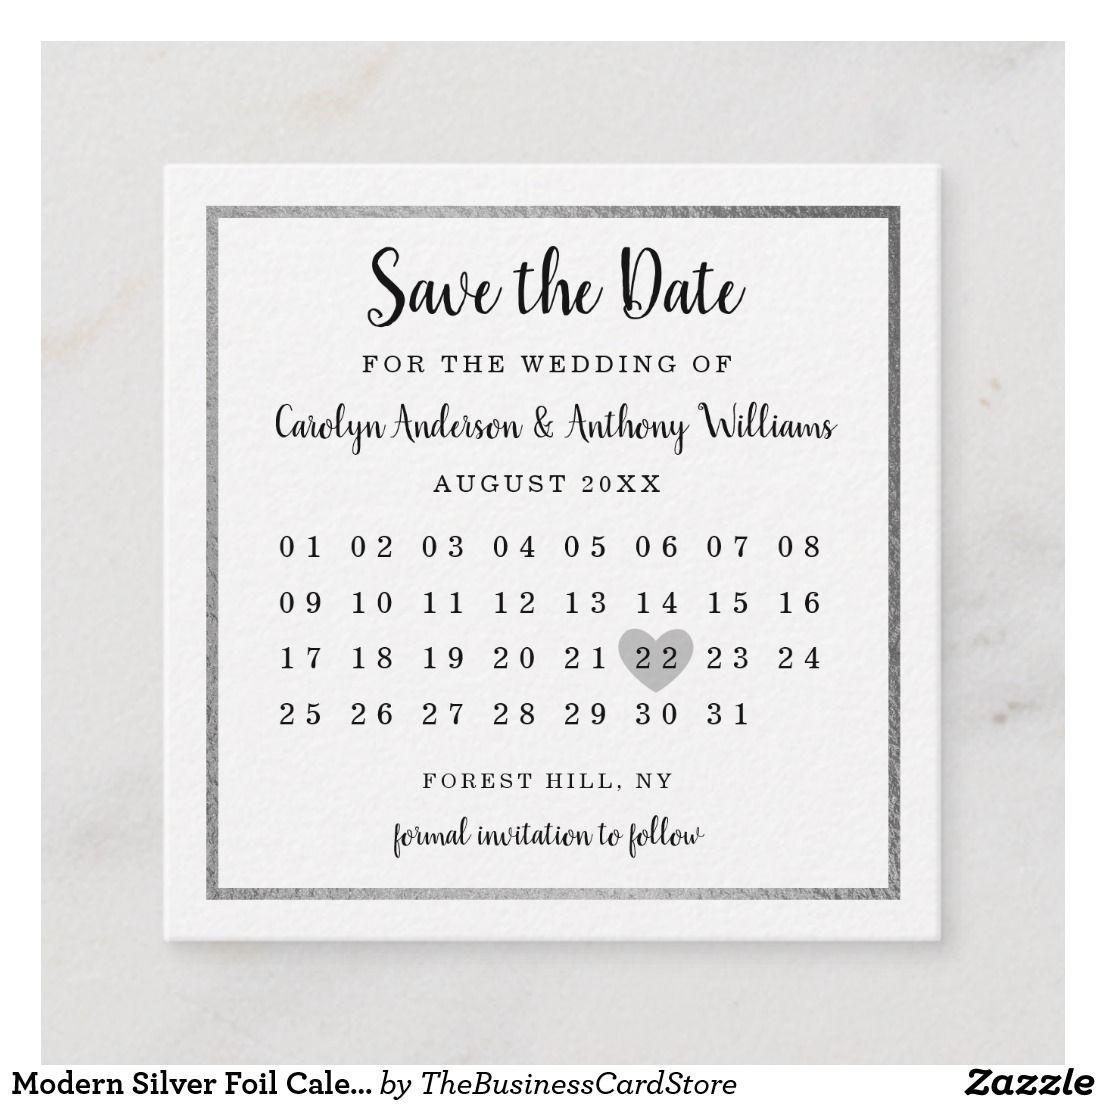 Modern Silver Foil Calendar Save The Date Enclosure Card